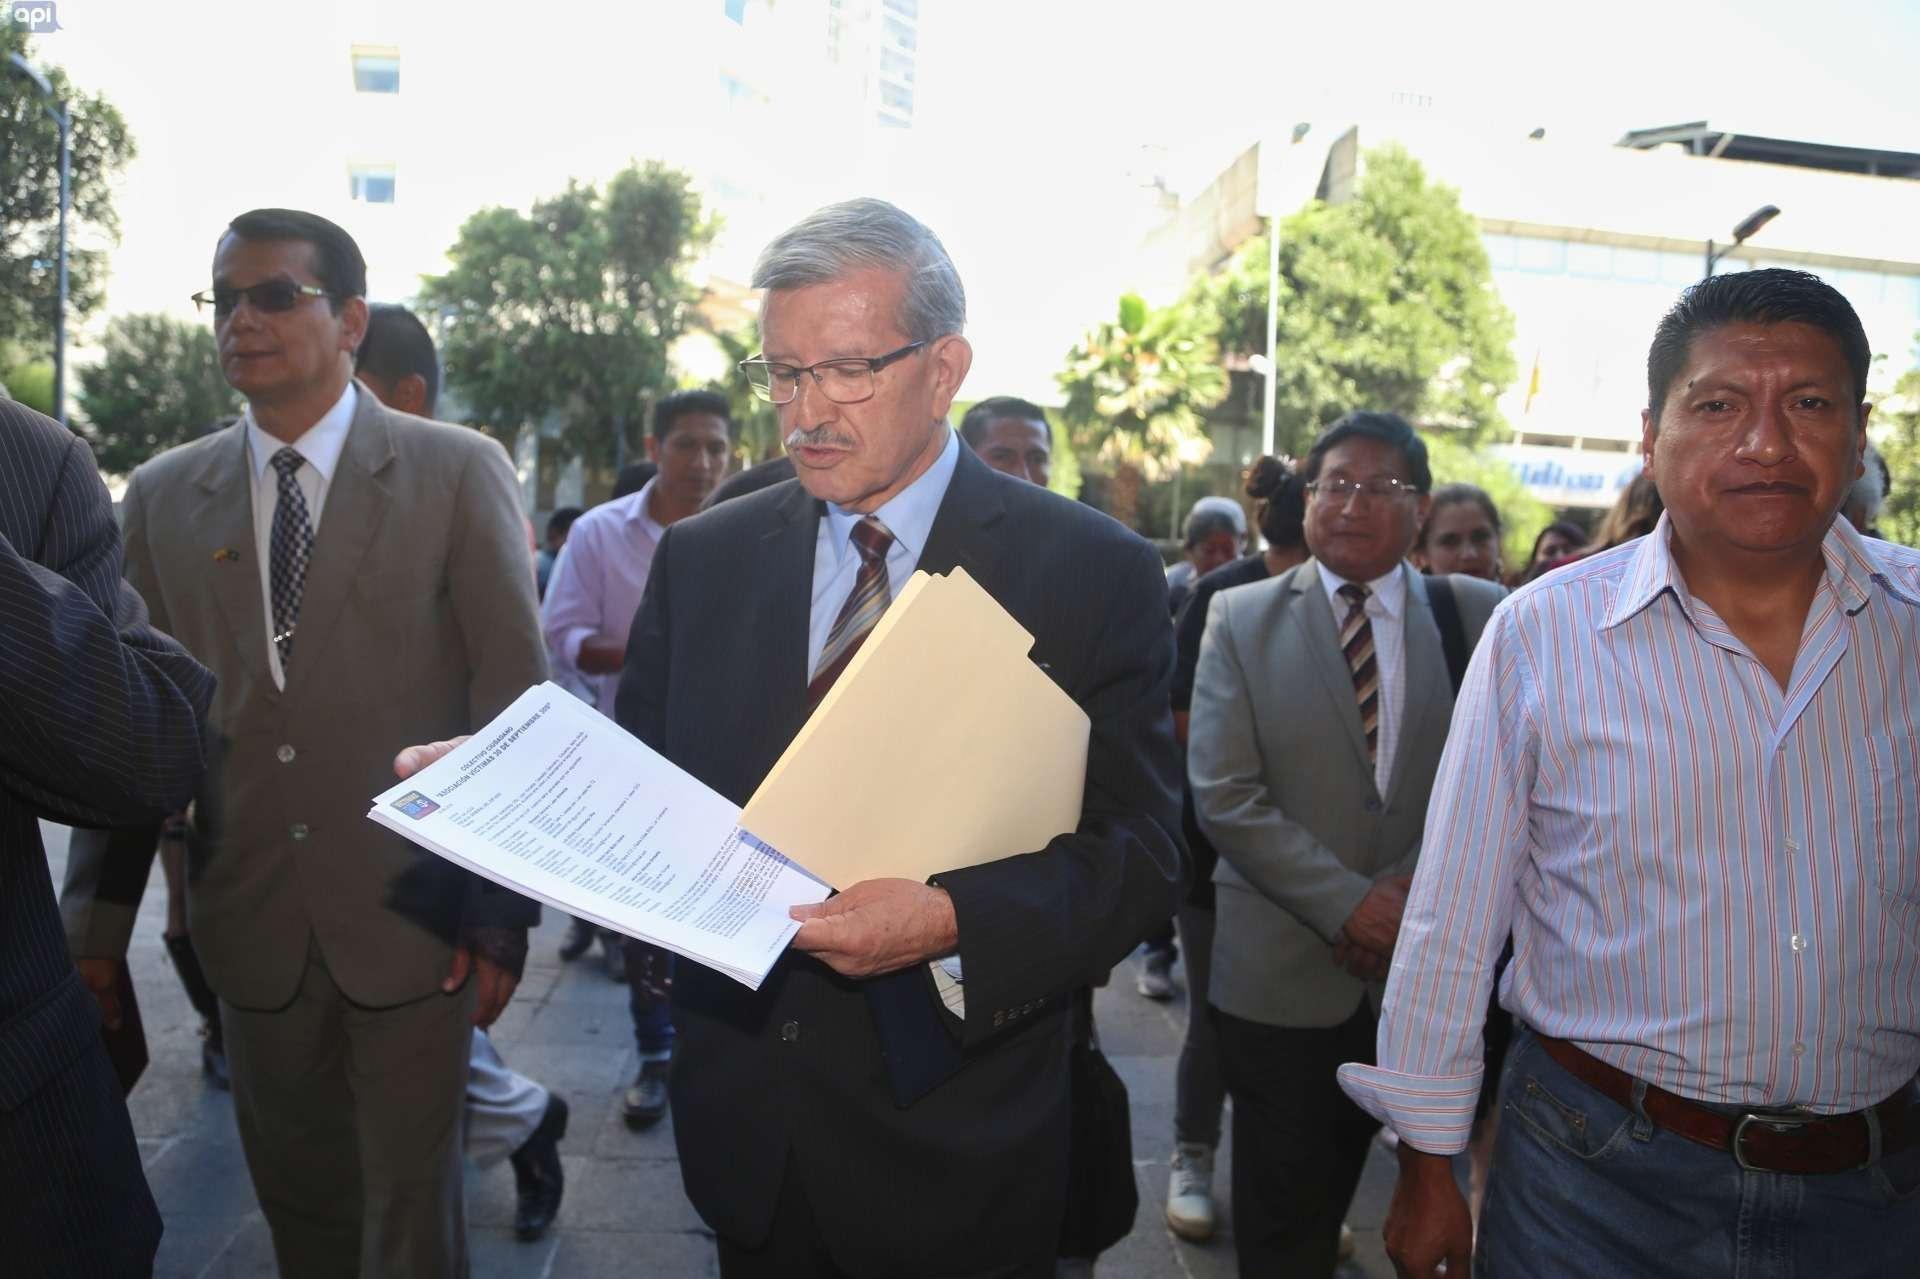 Photo of 30-S: expolicías buscan inocencia con un recurso de revisión